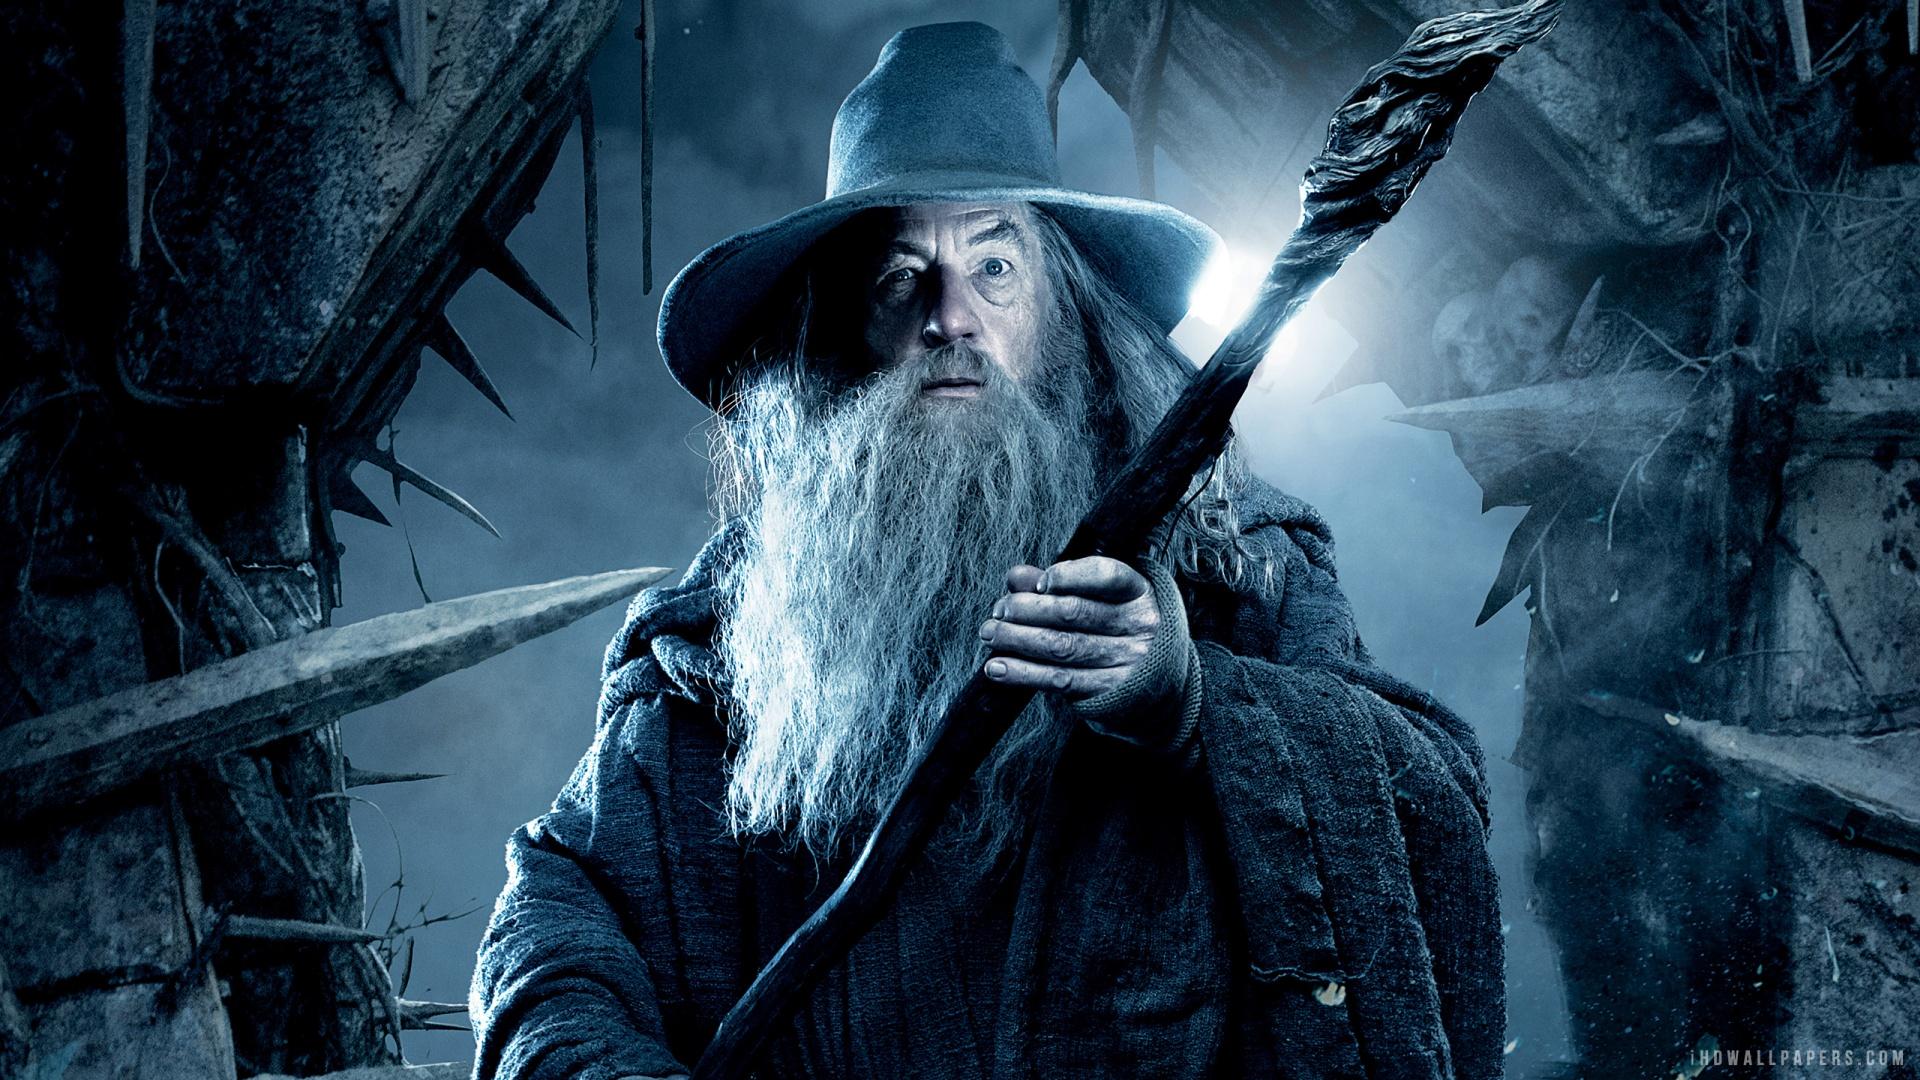 Gandalf in The Hobbit 2 HD Wallpaper   iHD Wallpapers 1920x1080